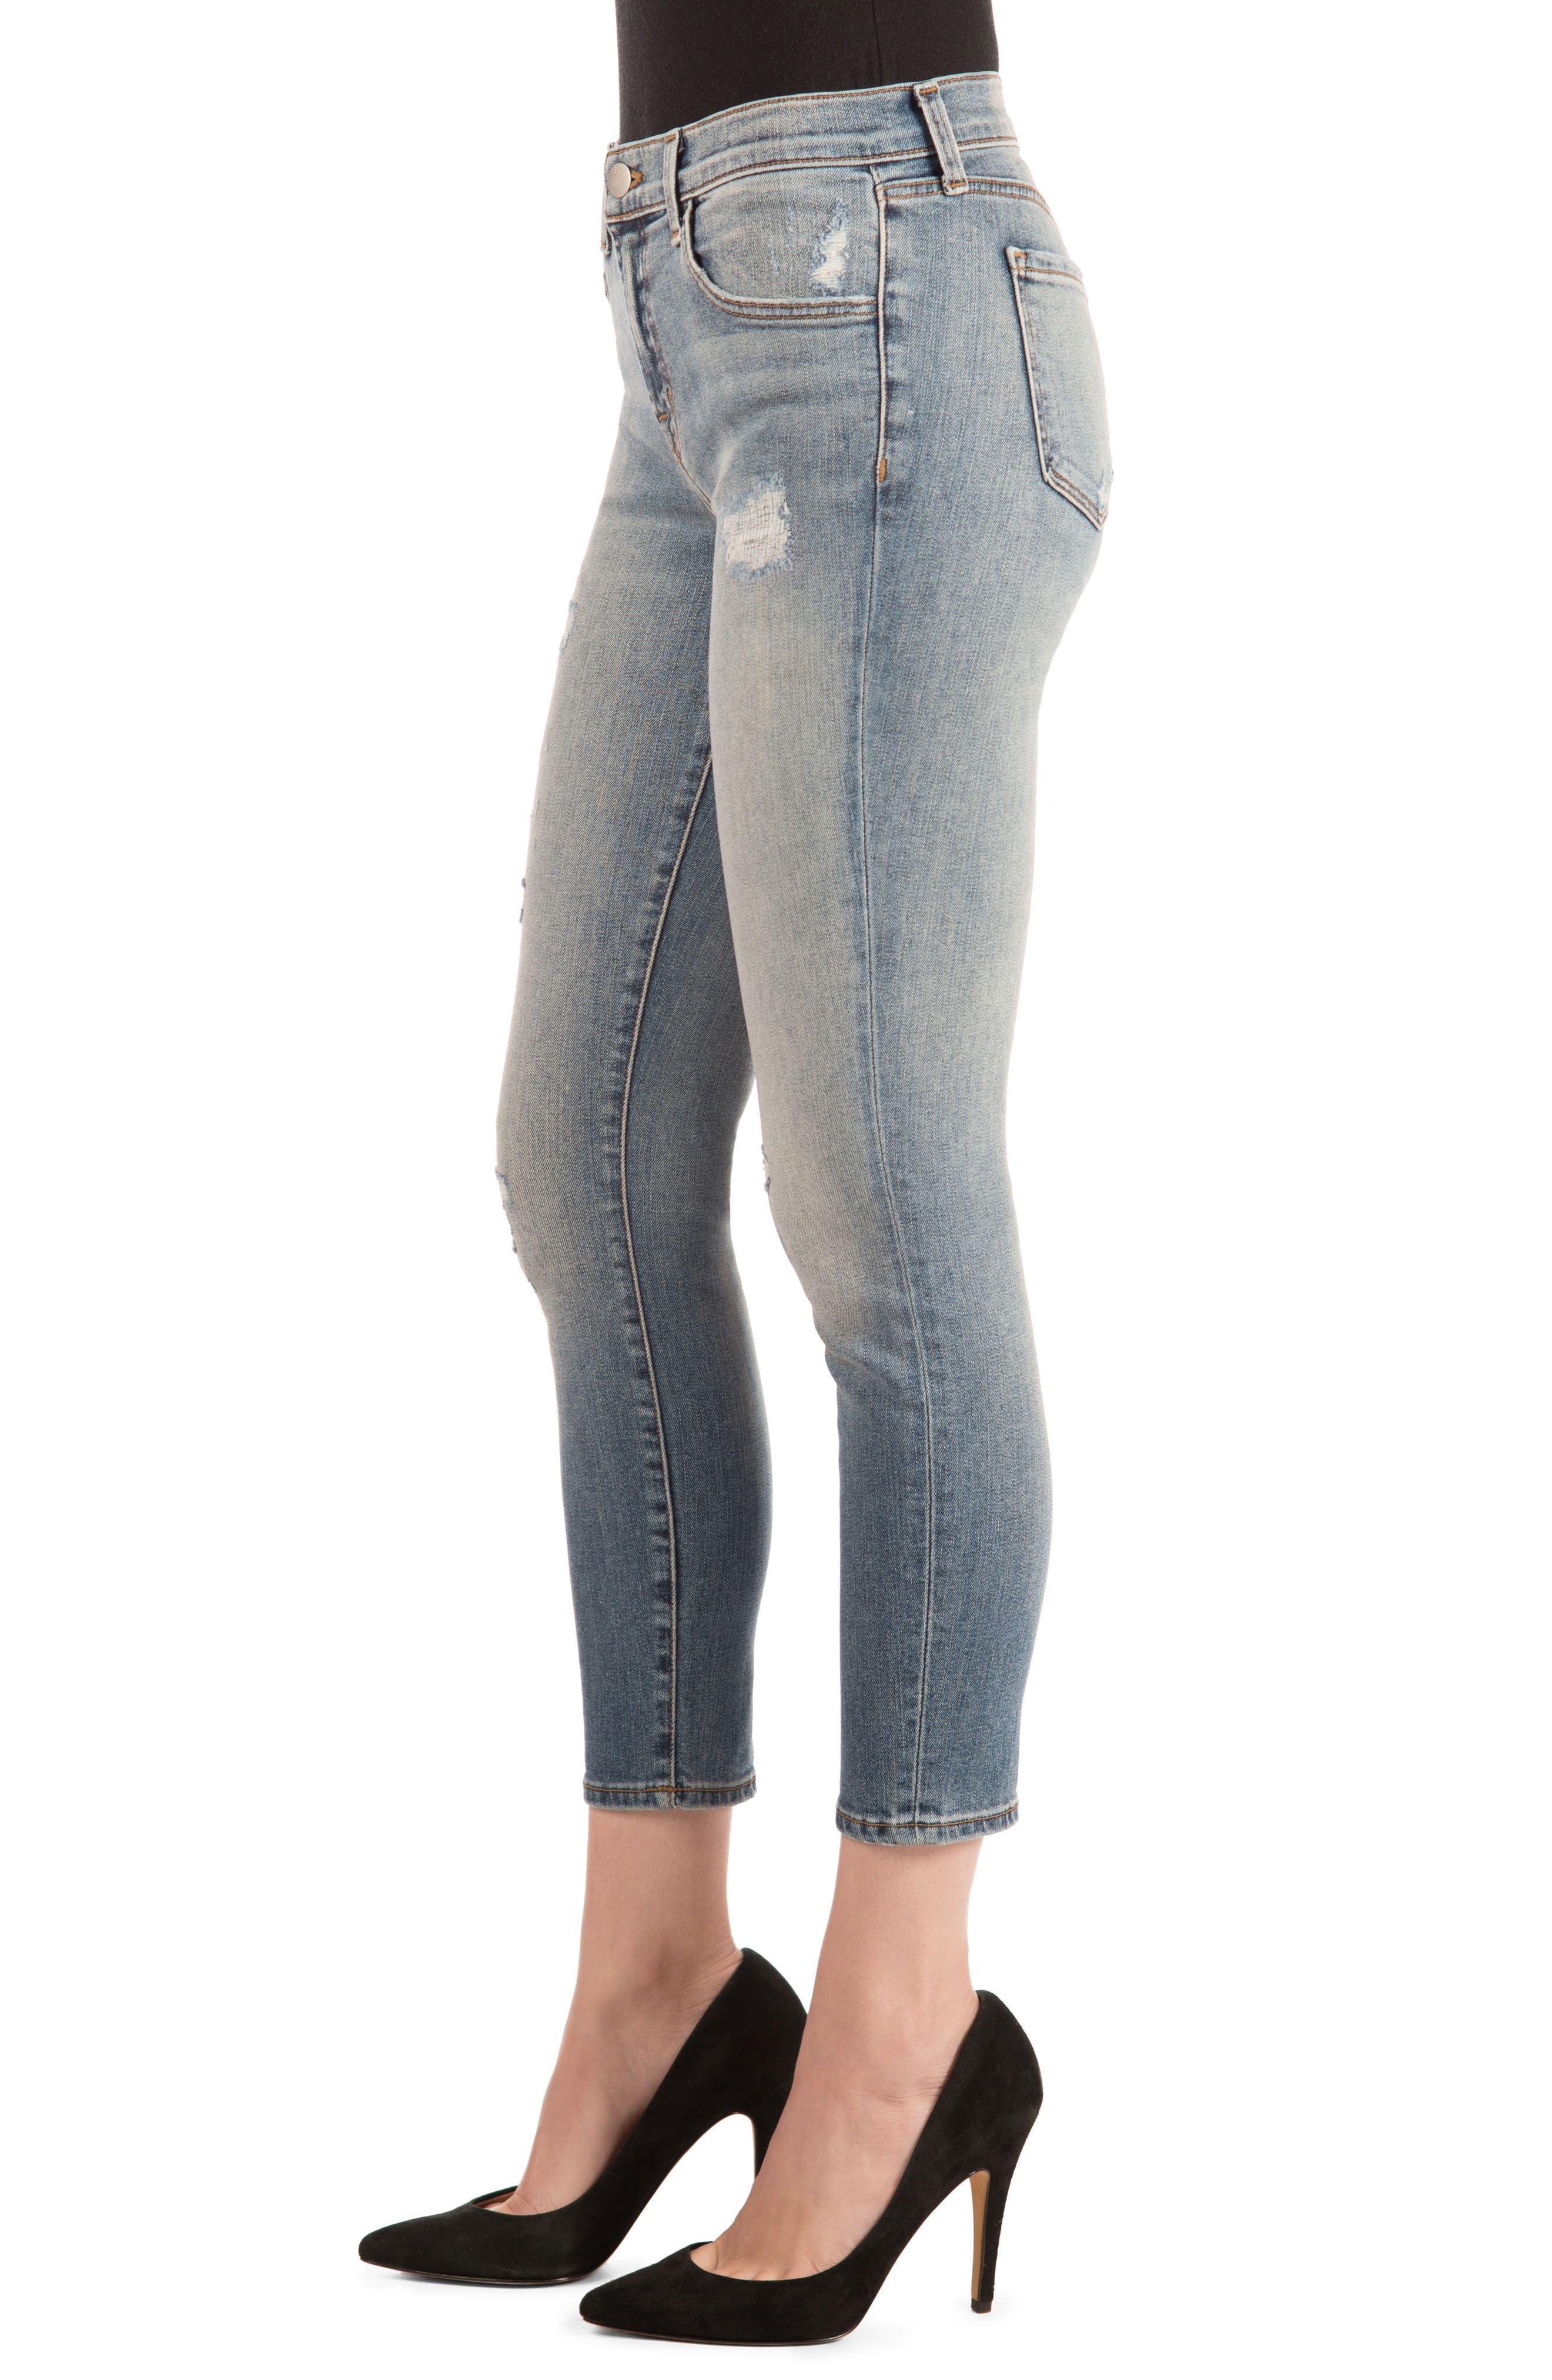 835 Distressed Capri Skinny Jeans,                             Alternate thumbnail 3, color,                             430